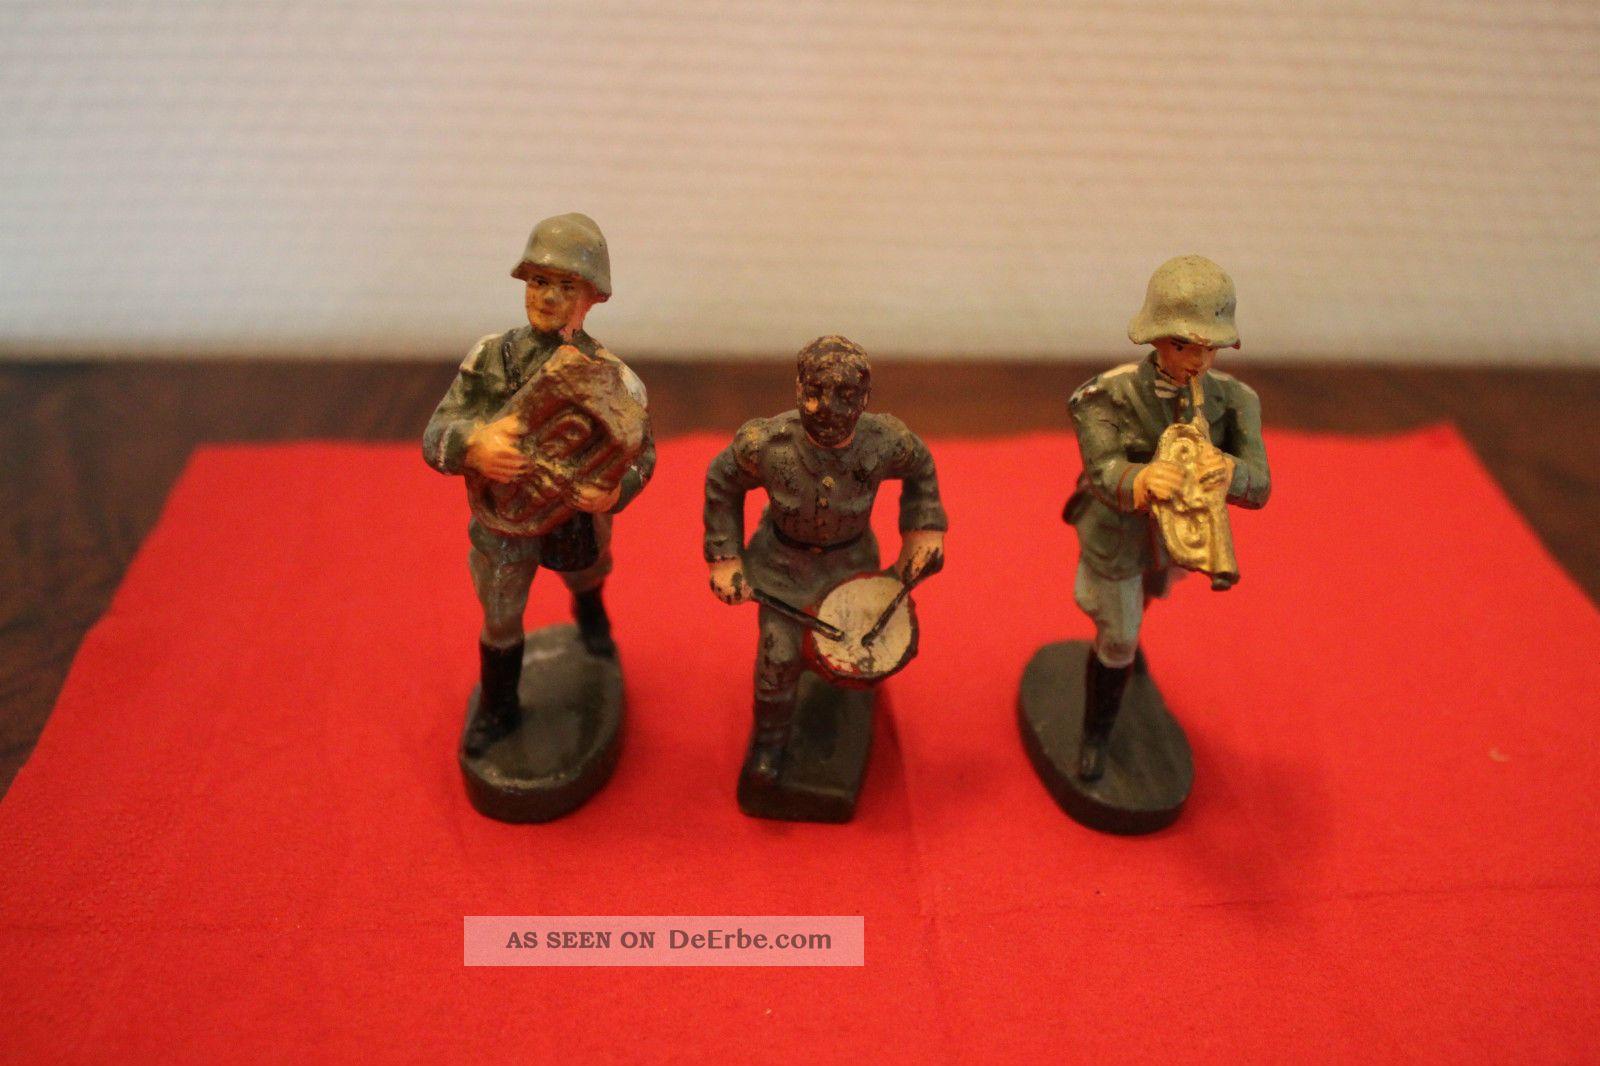 3 X Soldat Musiker Trompete,  Trommel,  Tenorhorn,  Lineol,  Elastolin Gefertigt vor 1945 Bild